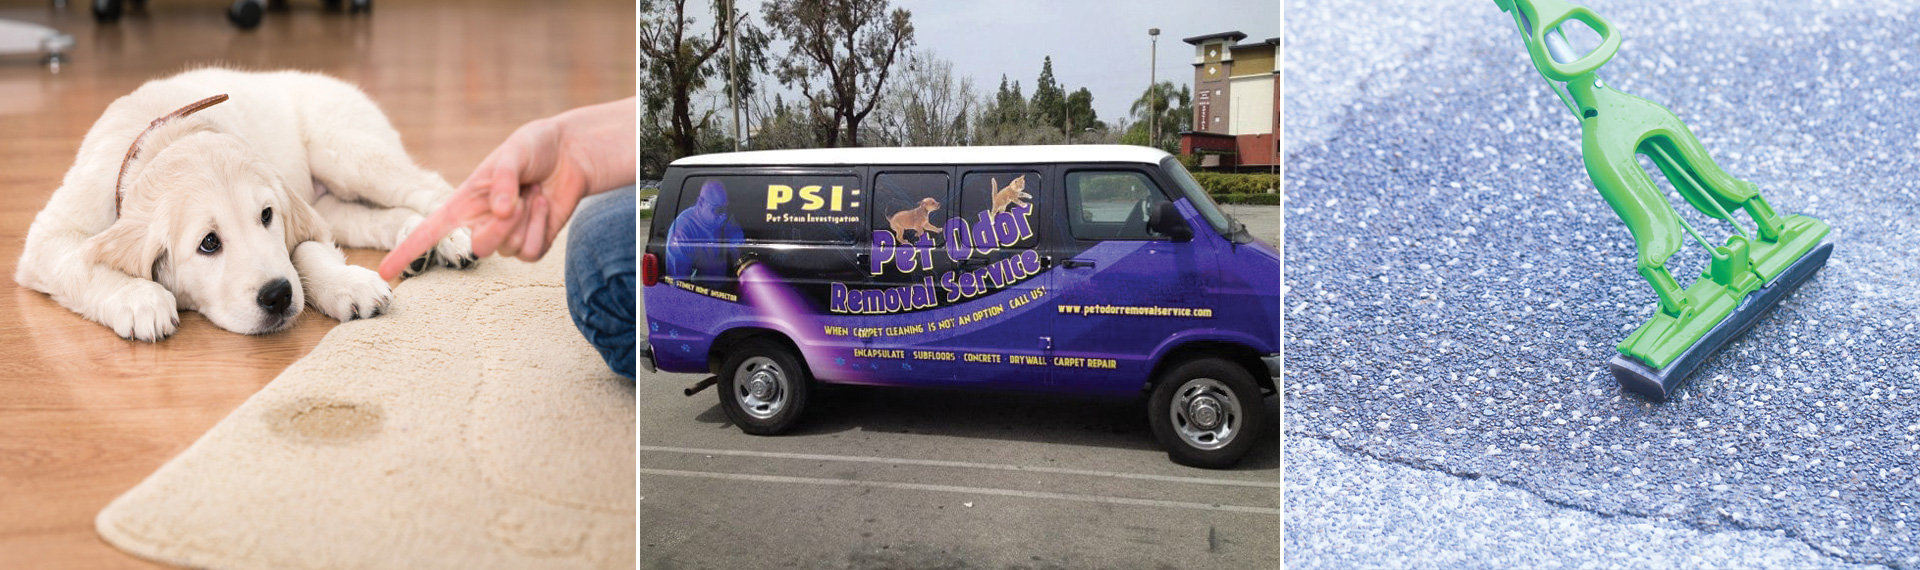 Pet Odor Removal Service Laguna Hills CA